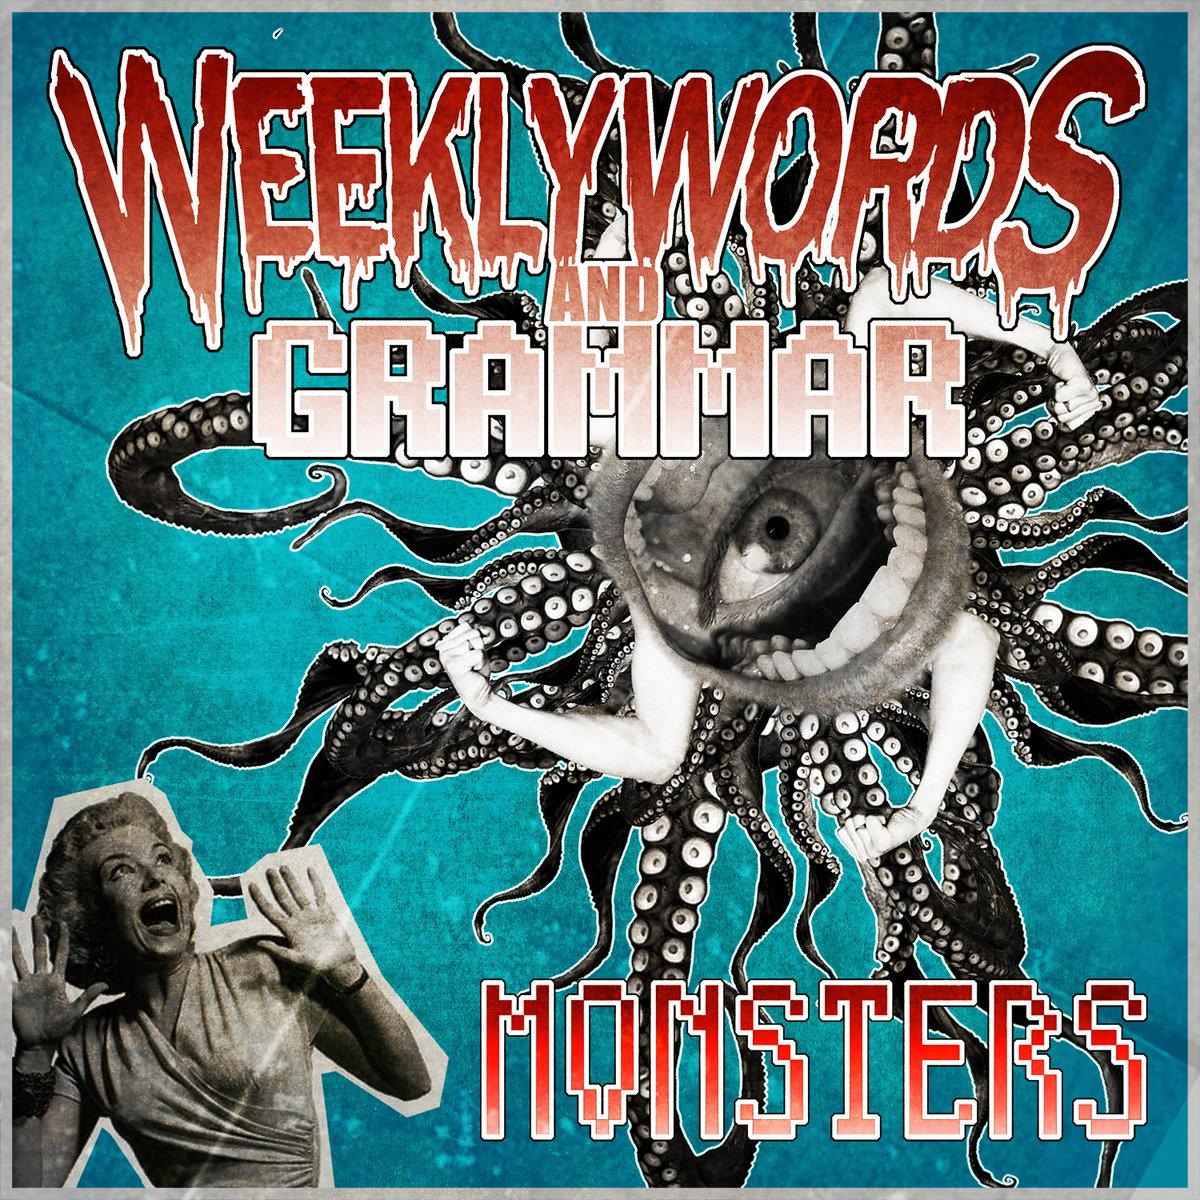 Weekly Words and Grammar - MONSTERS [EP] (2016)